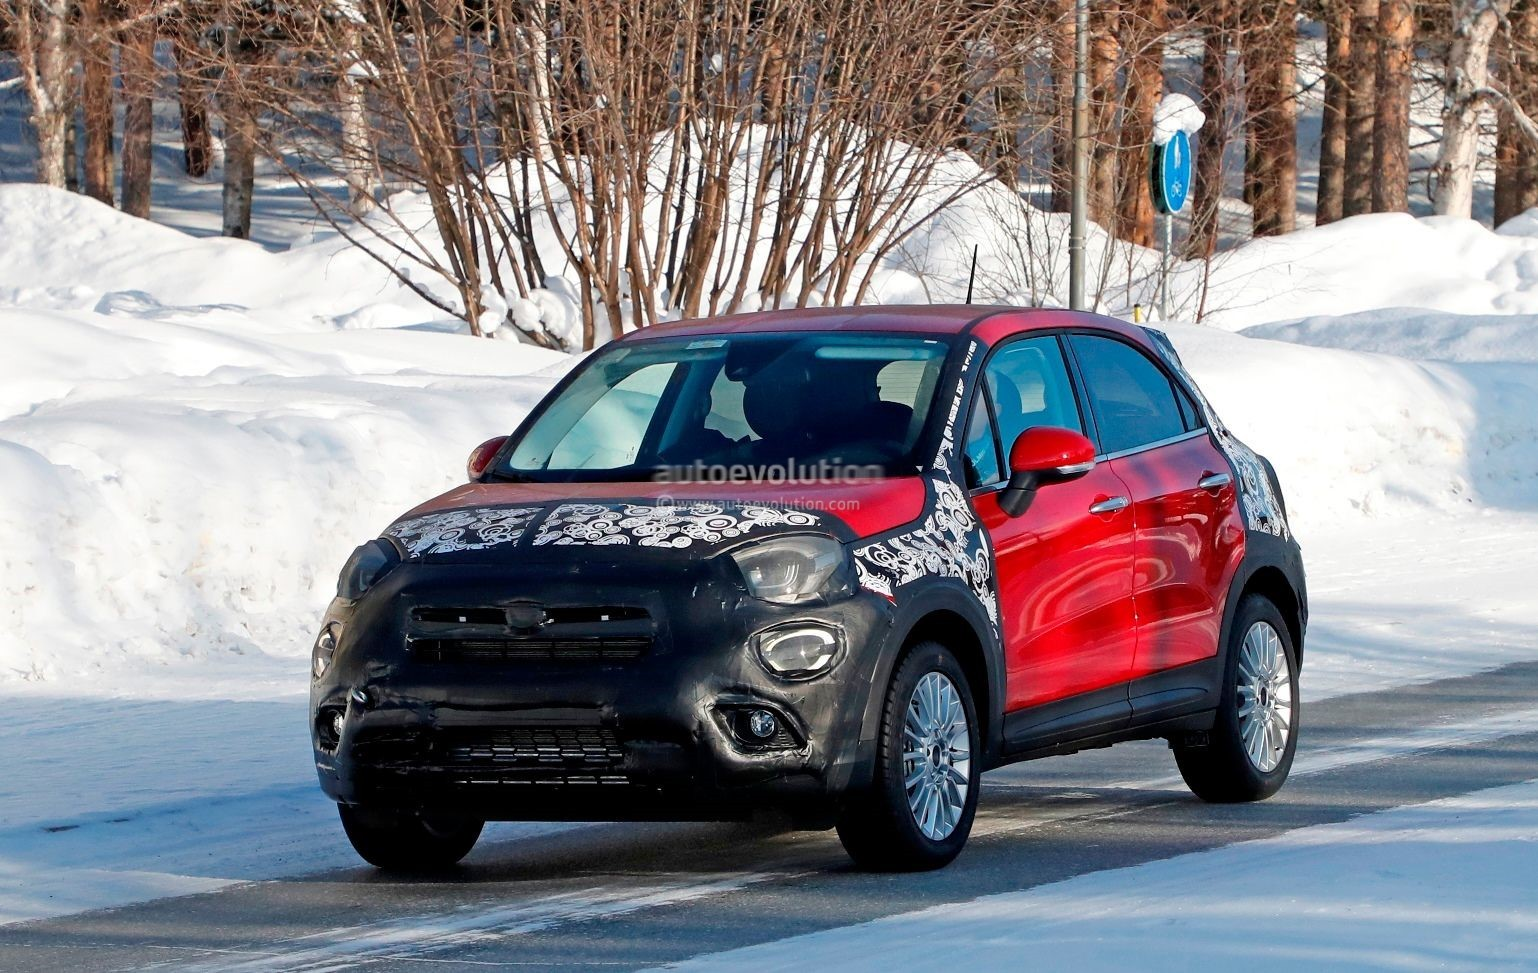 2019 Fiat 500X Facelift Spied Testing In Sweden